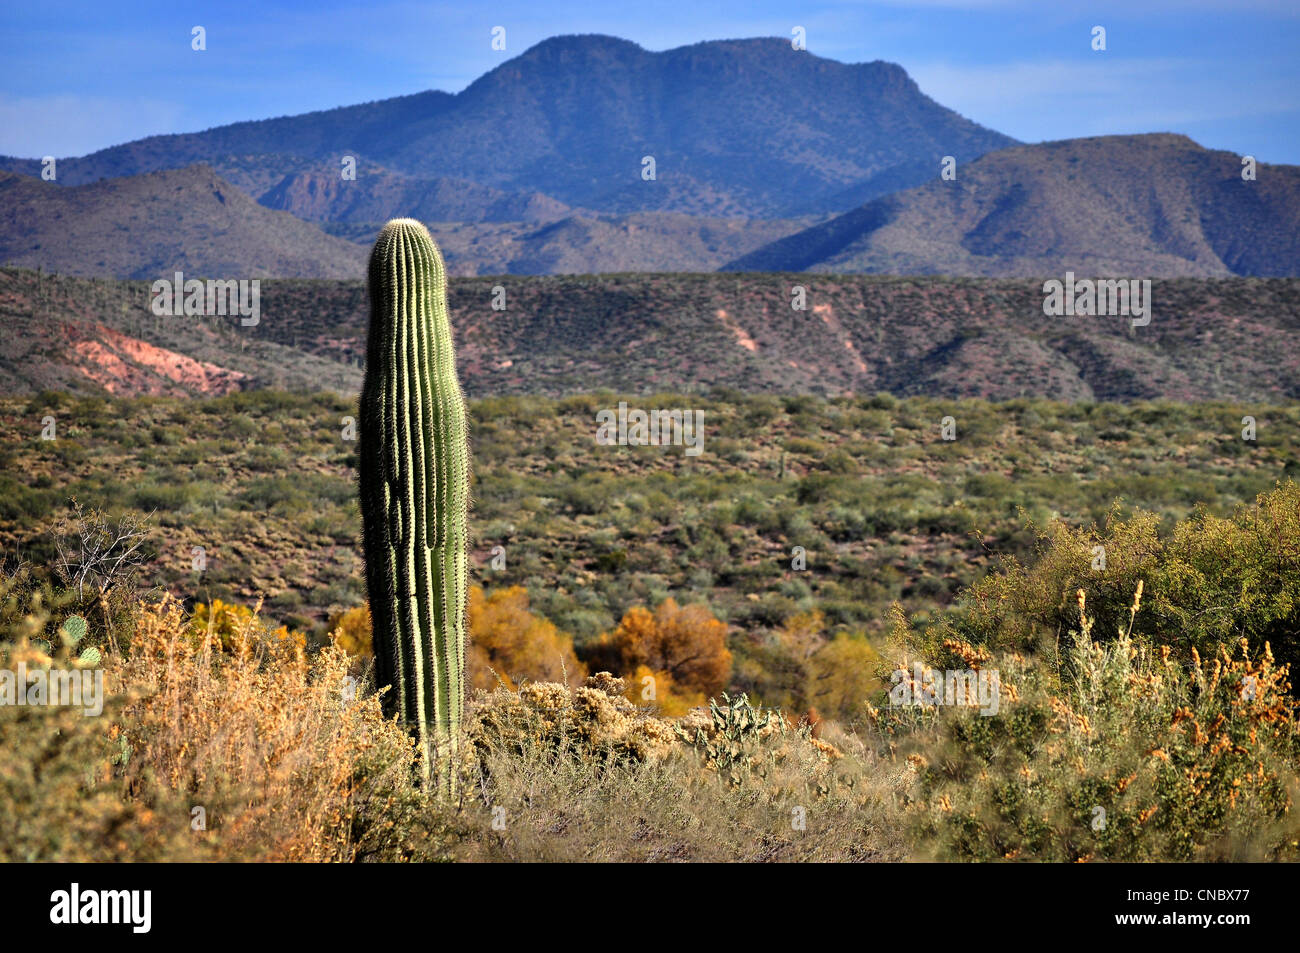 arizona desert landscape with